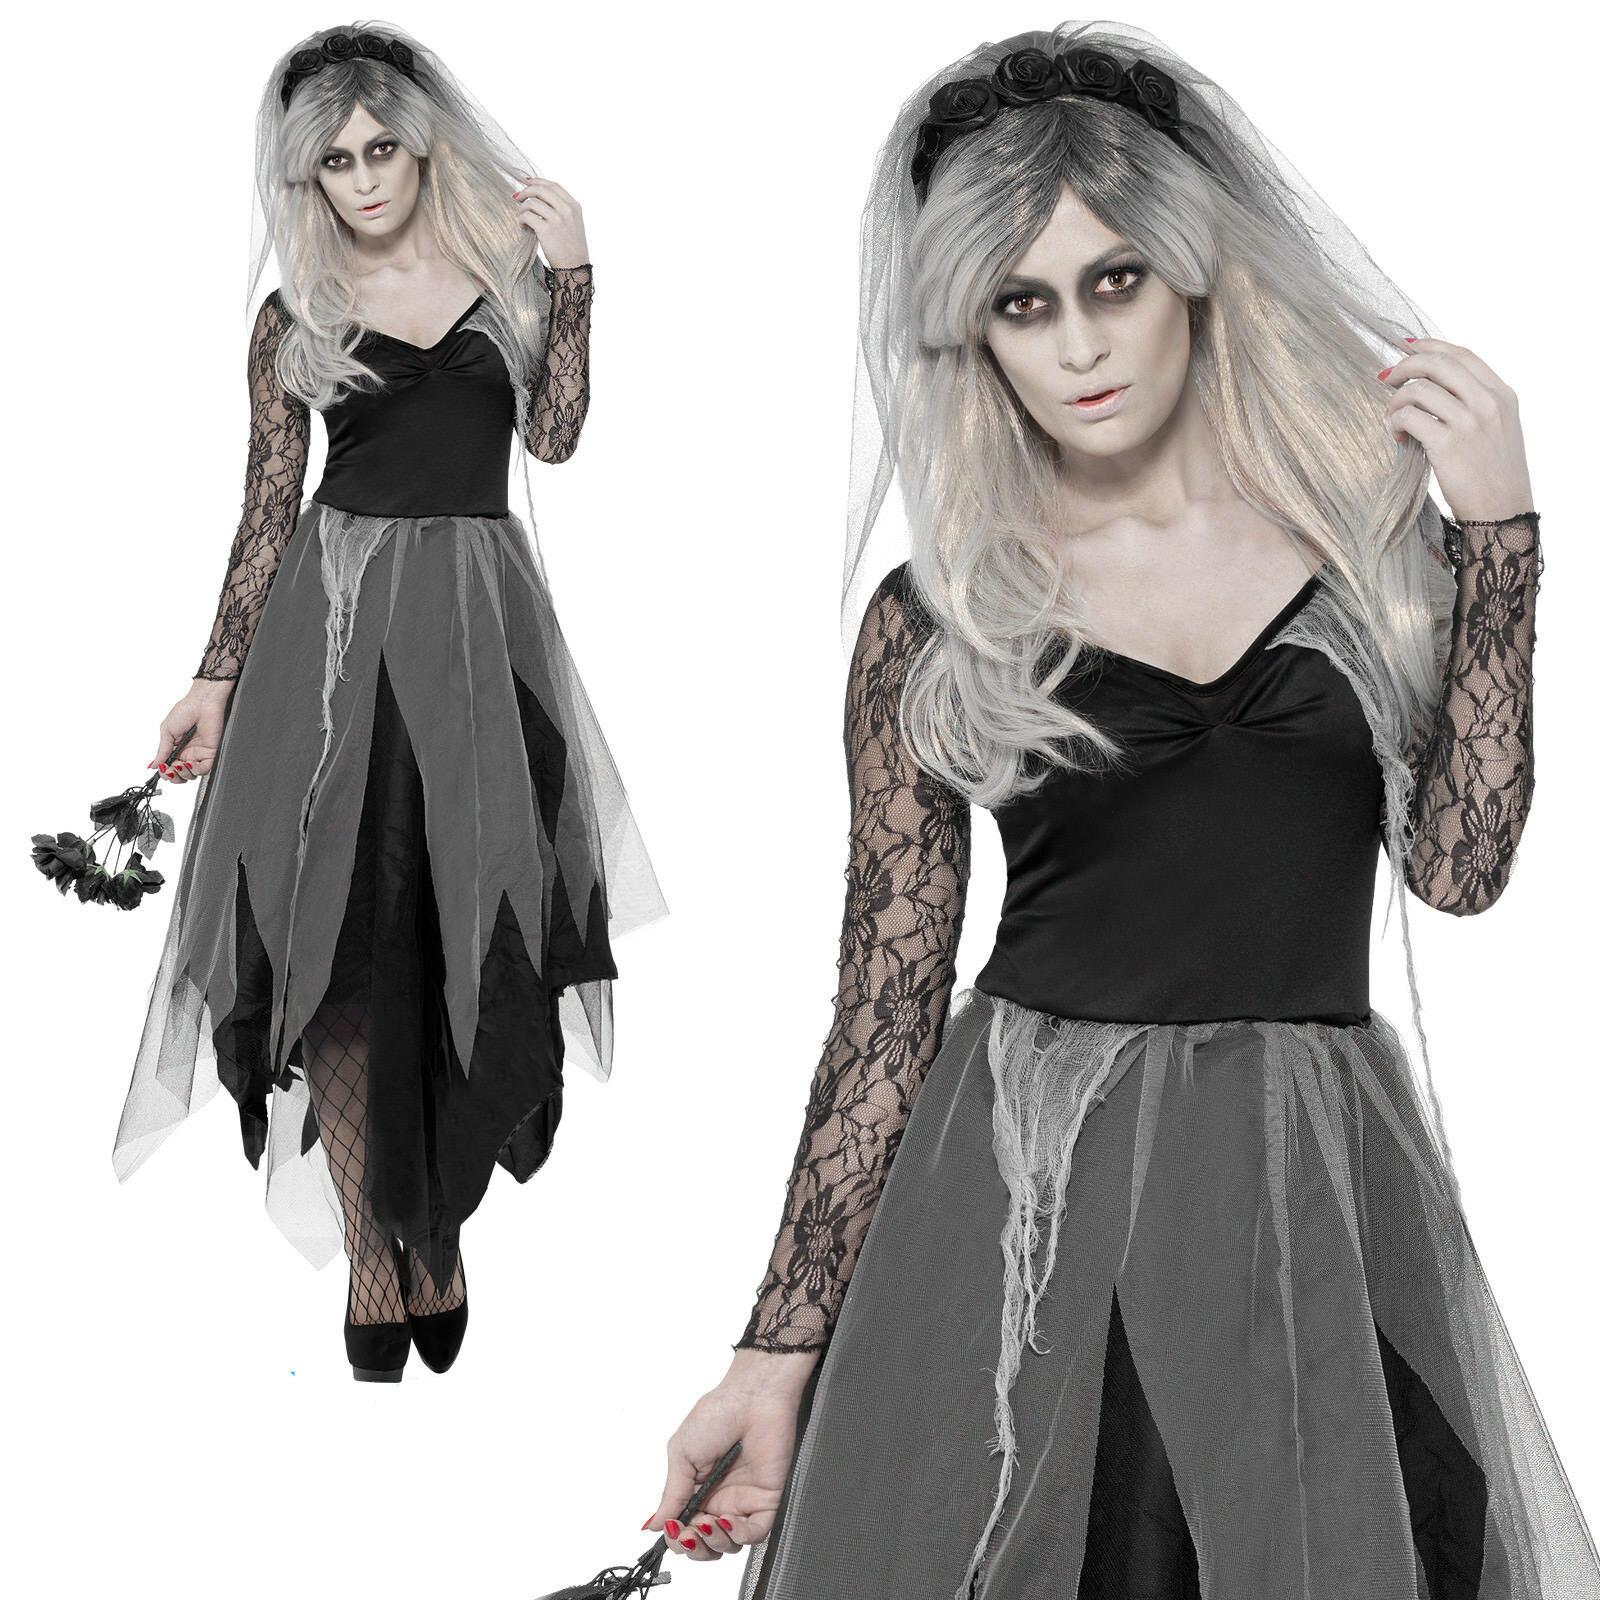 Zombie Graveyard Ghost Bride Maid Costume Corpse Womens Halloween Ghost  Plus Size Fancy Dress Costumes Qawc-2812 - Buy Ghost Bride Costume,Bride  Maid ...